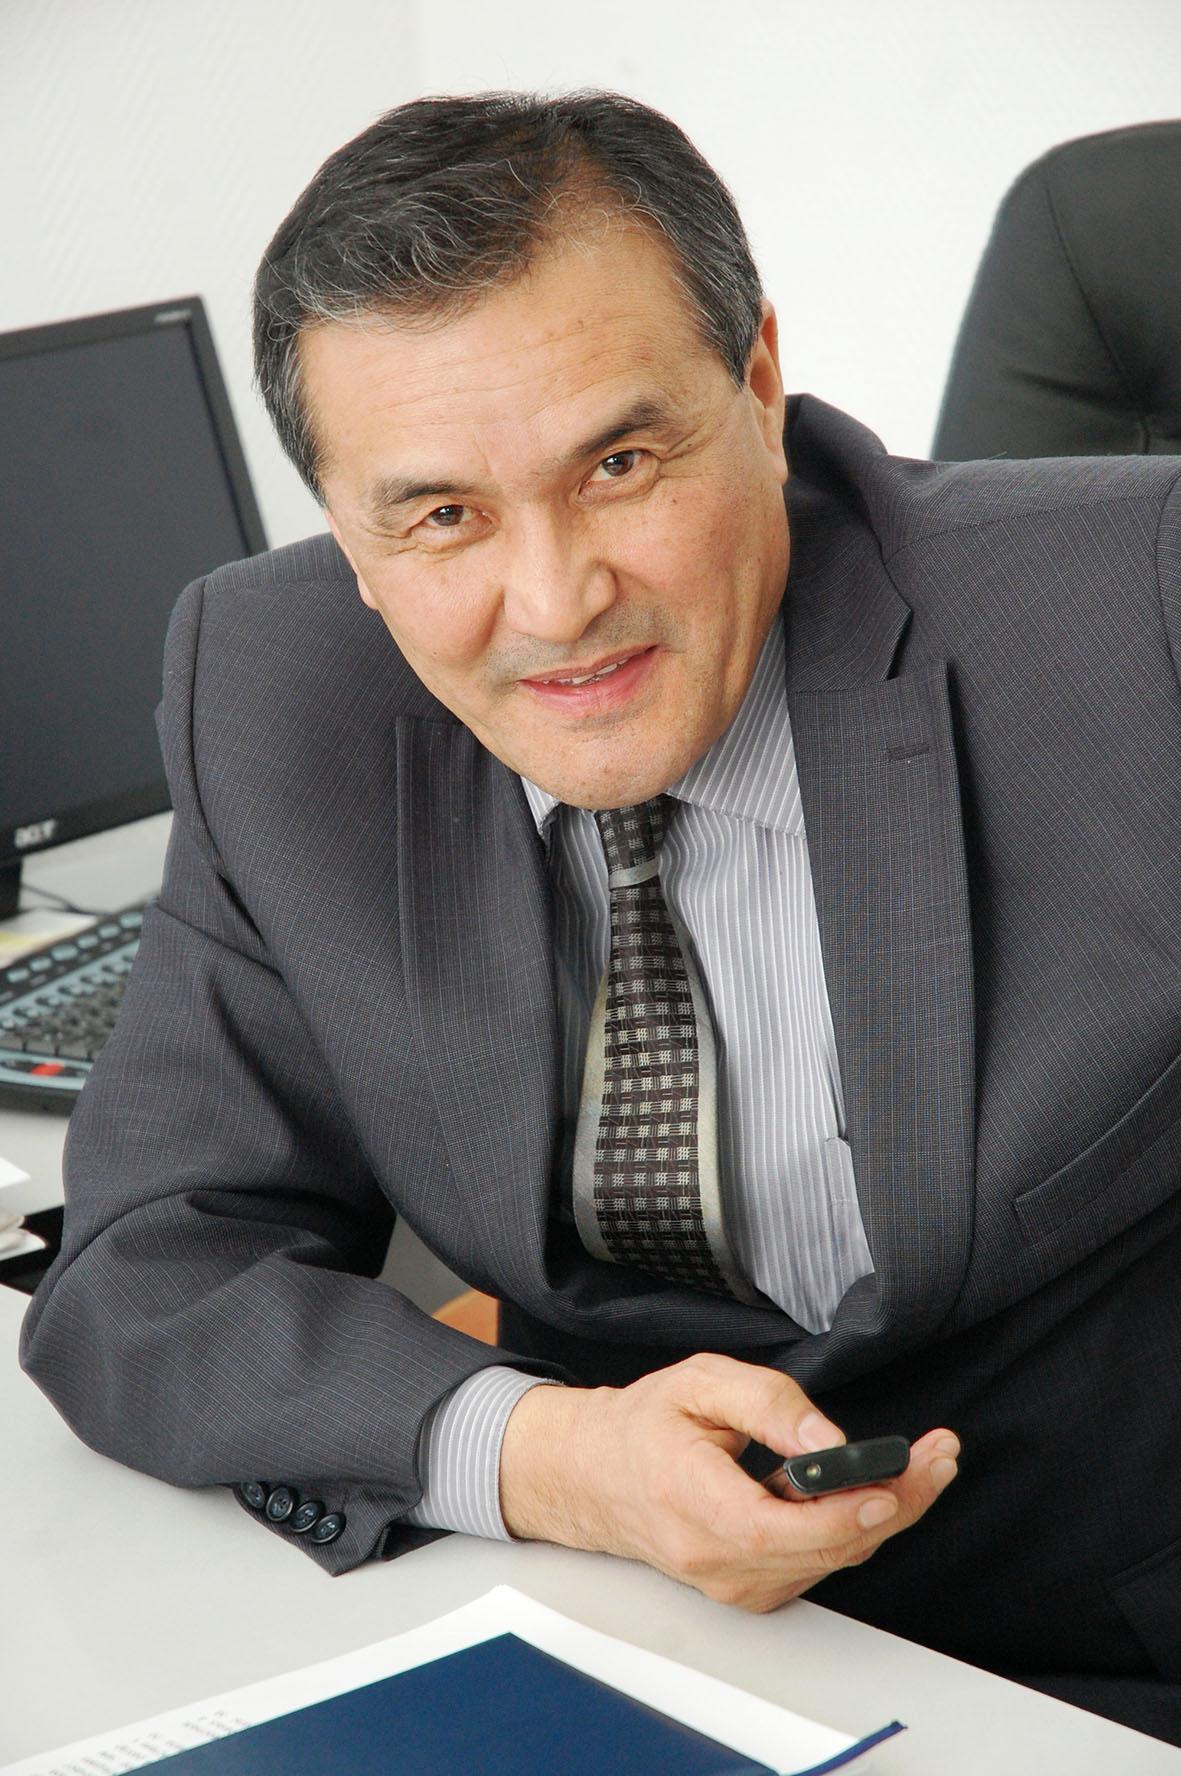 Серік Зәйкешұлы Смағұлов